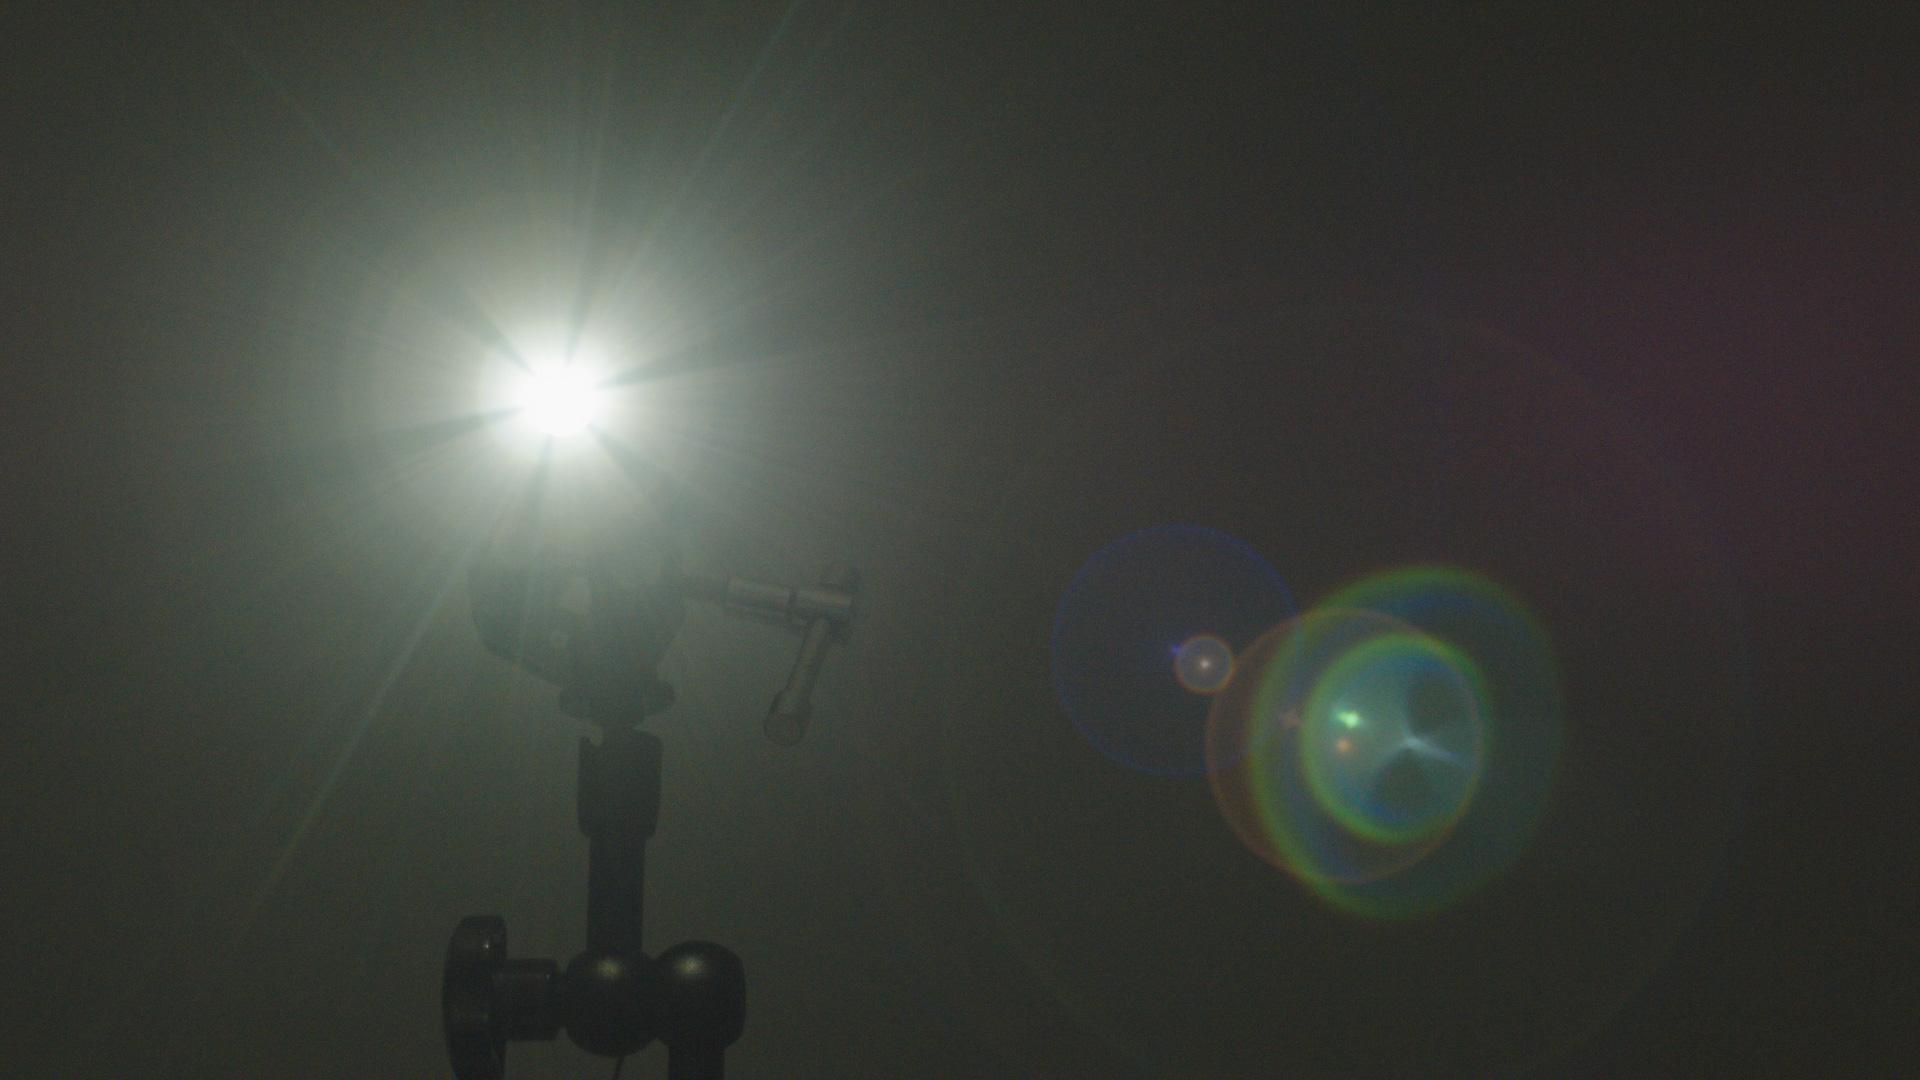 Flare-Yashica-50mm-f2.0.jpg